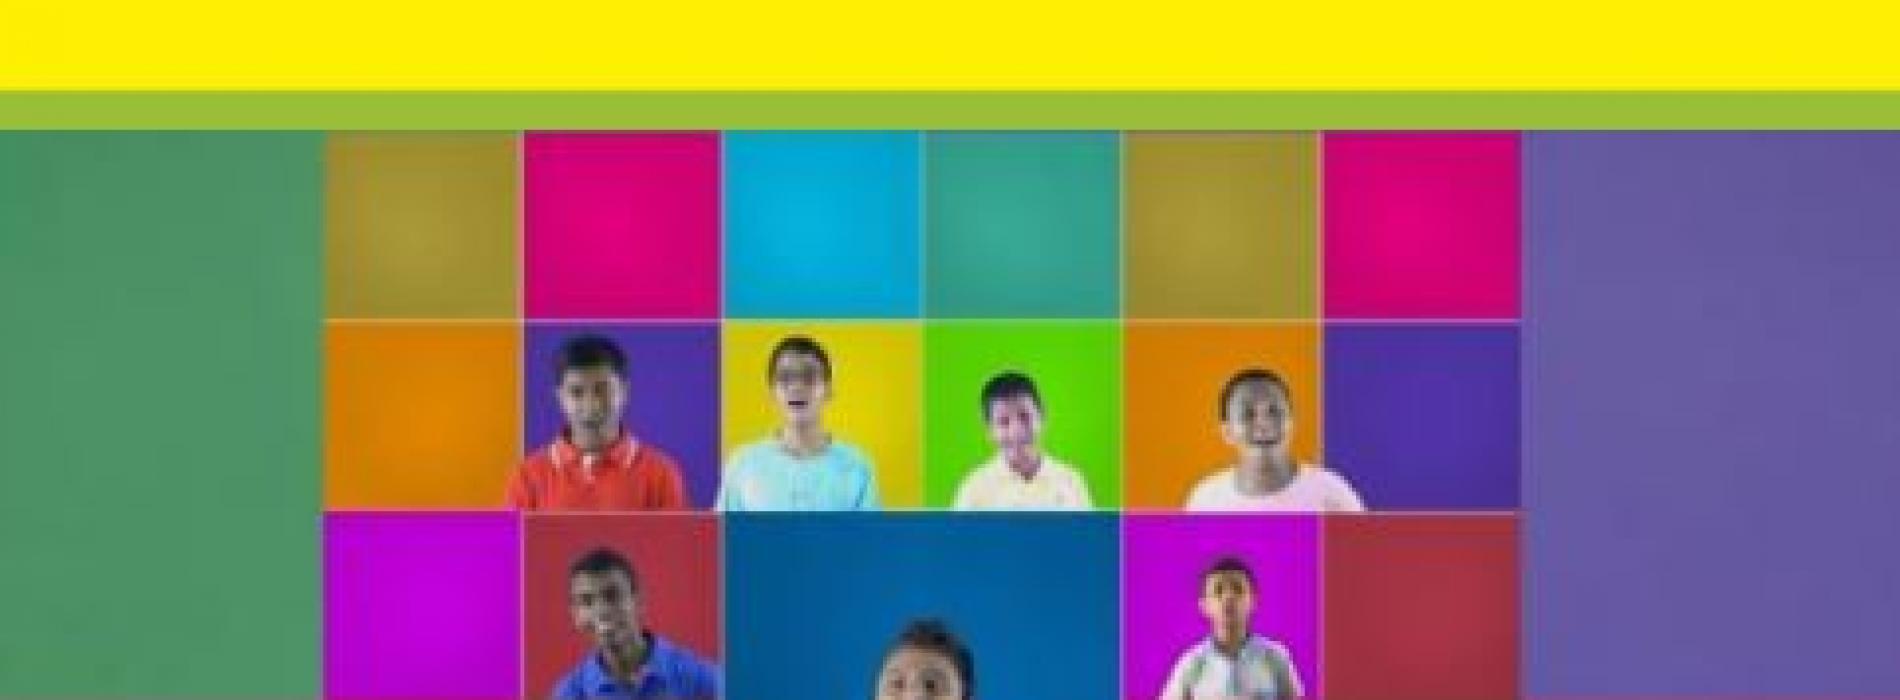 St. Thomas' Preparatory School Choir – Lean On/Sansara Sihine/Thee Thee Cover Medley